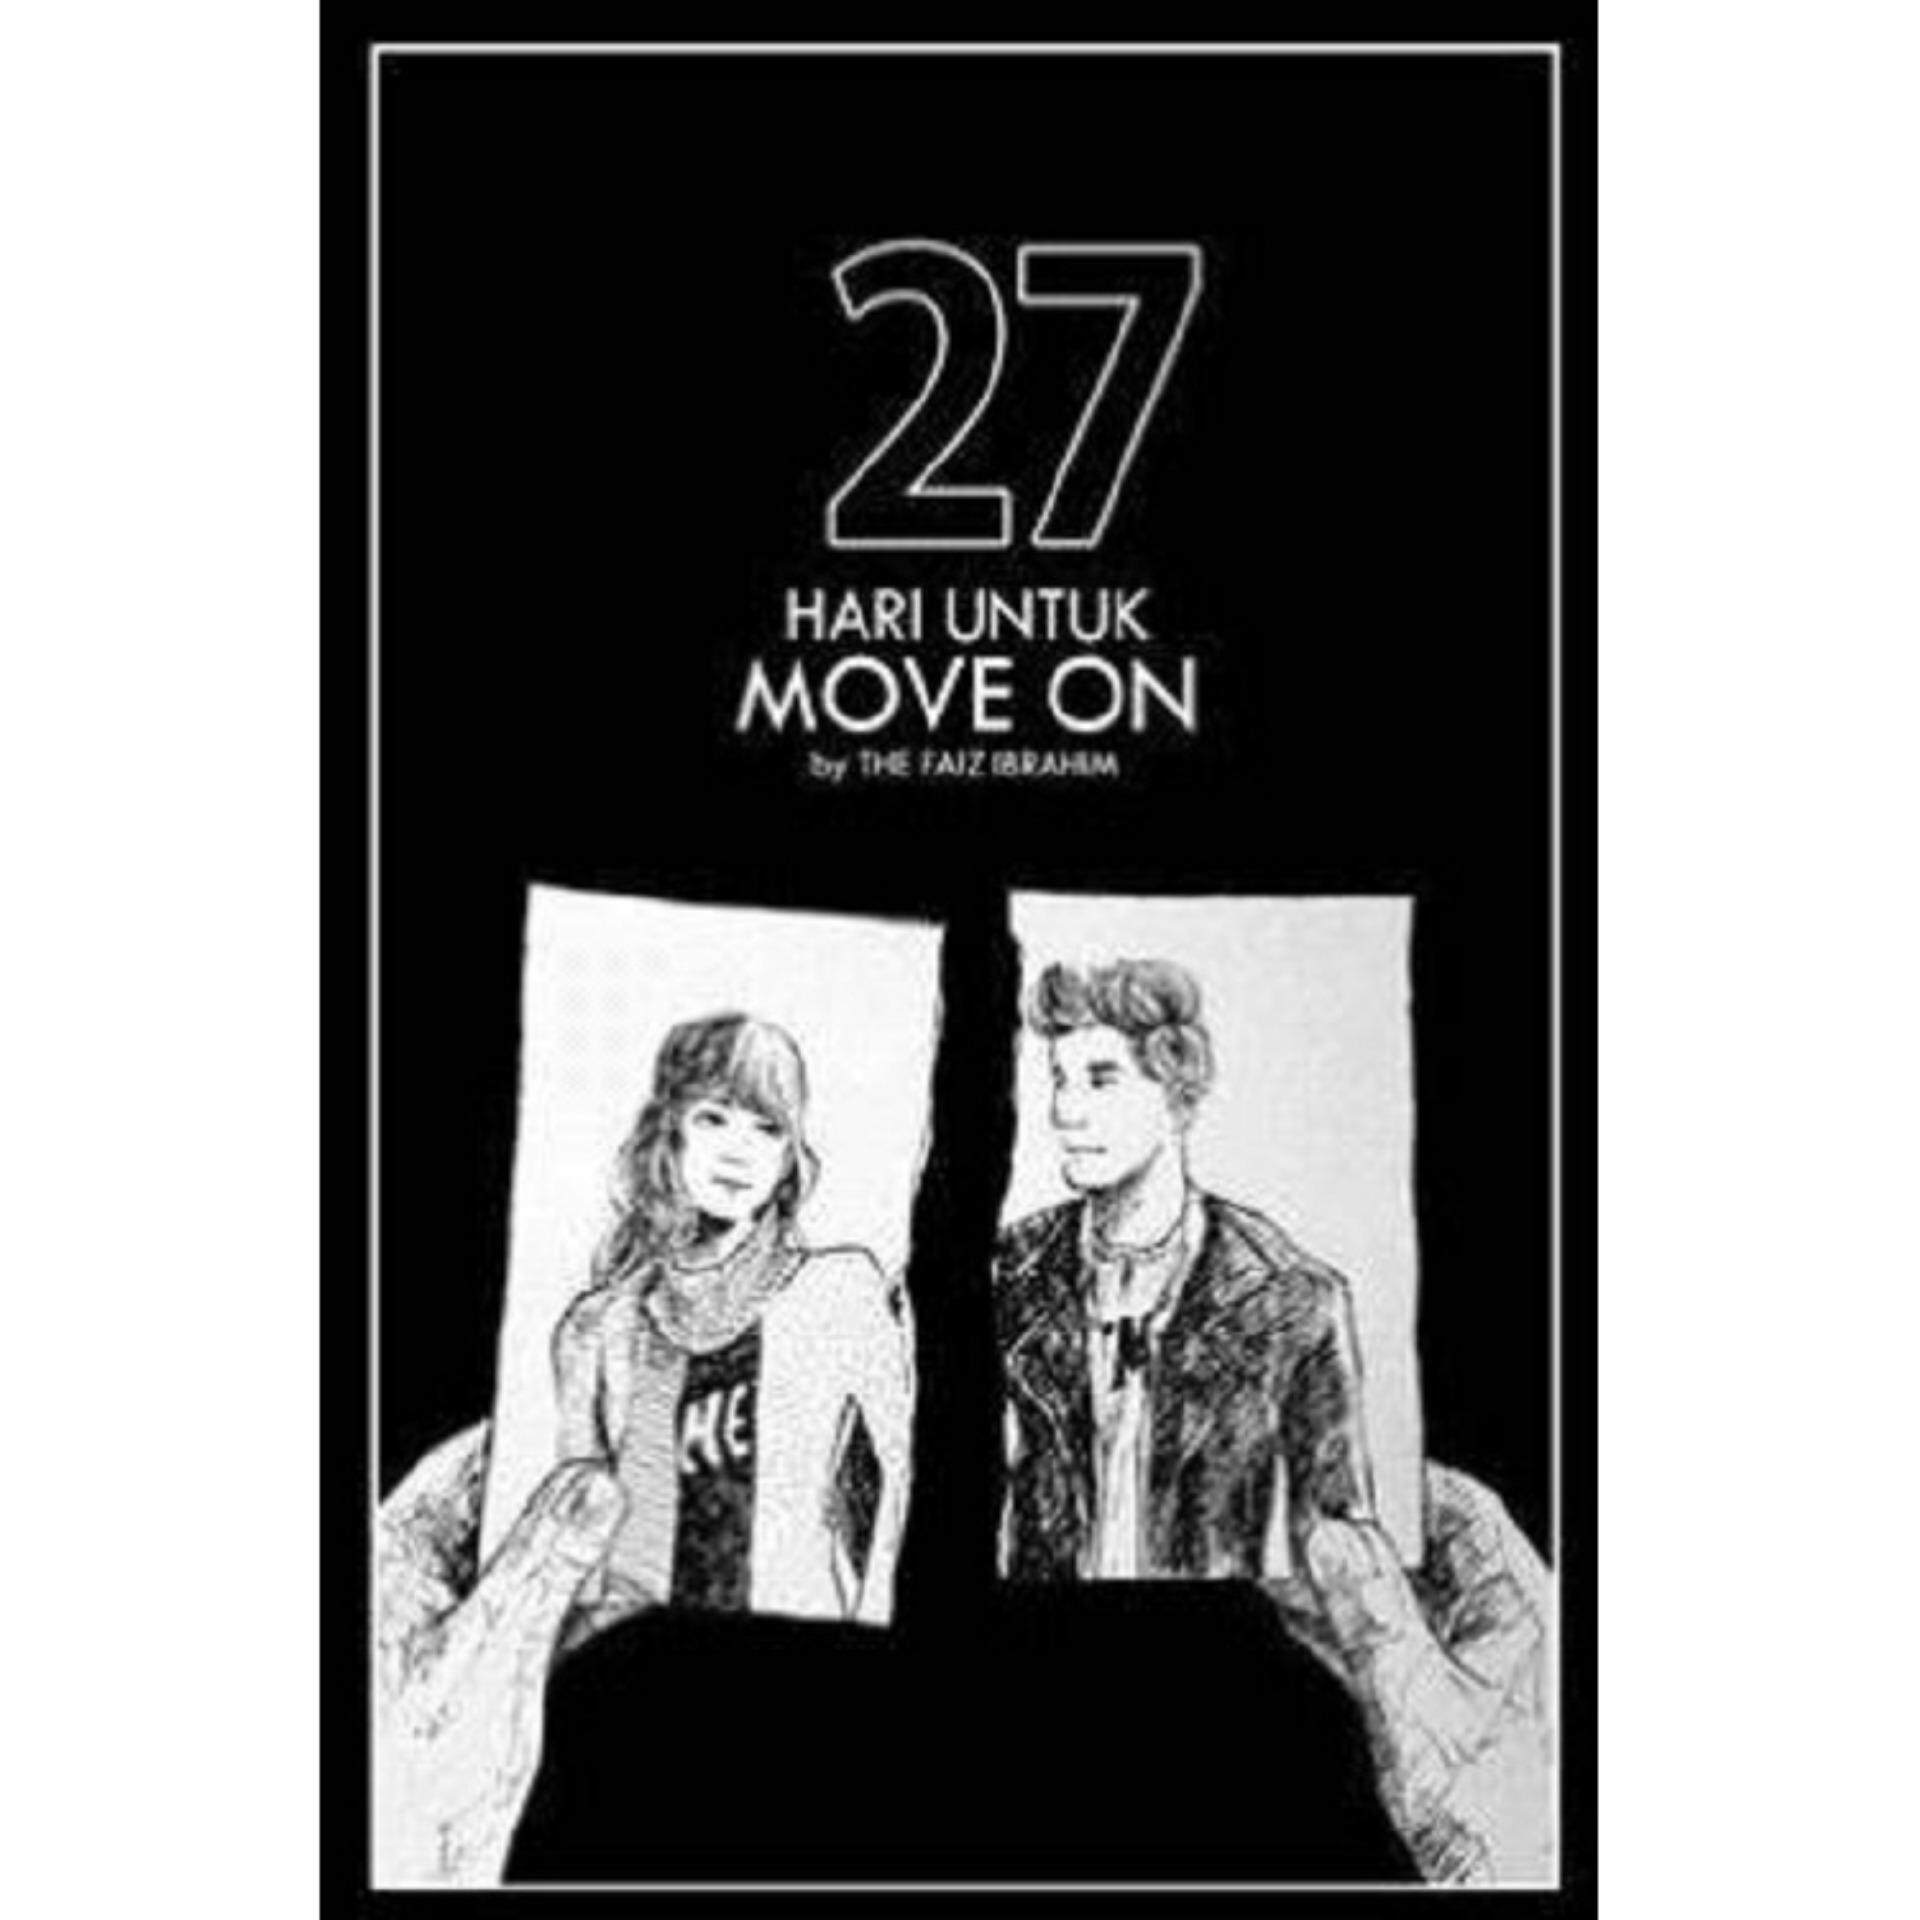 27 Hari untuk Move On: ISBN: 9789671342831: Author by: Faiz Ibrahim